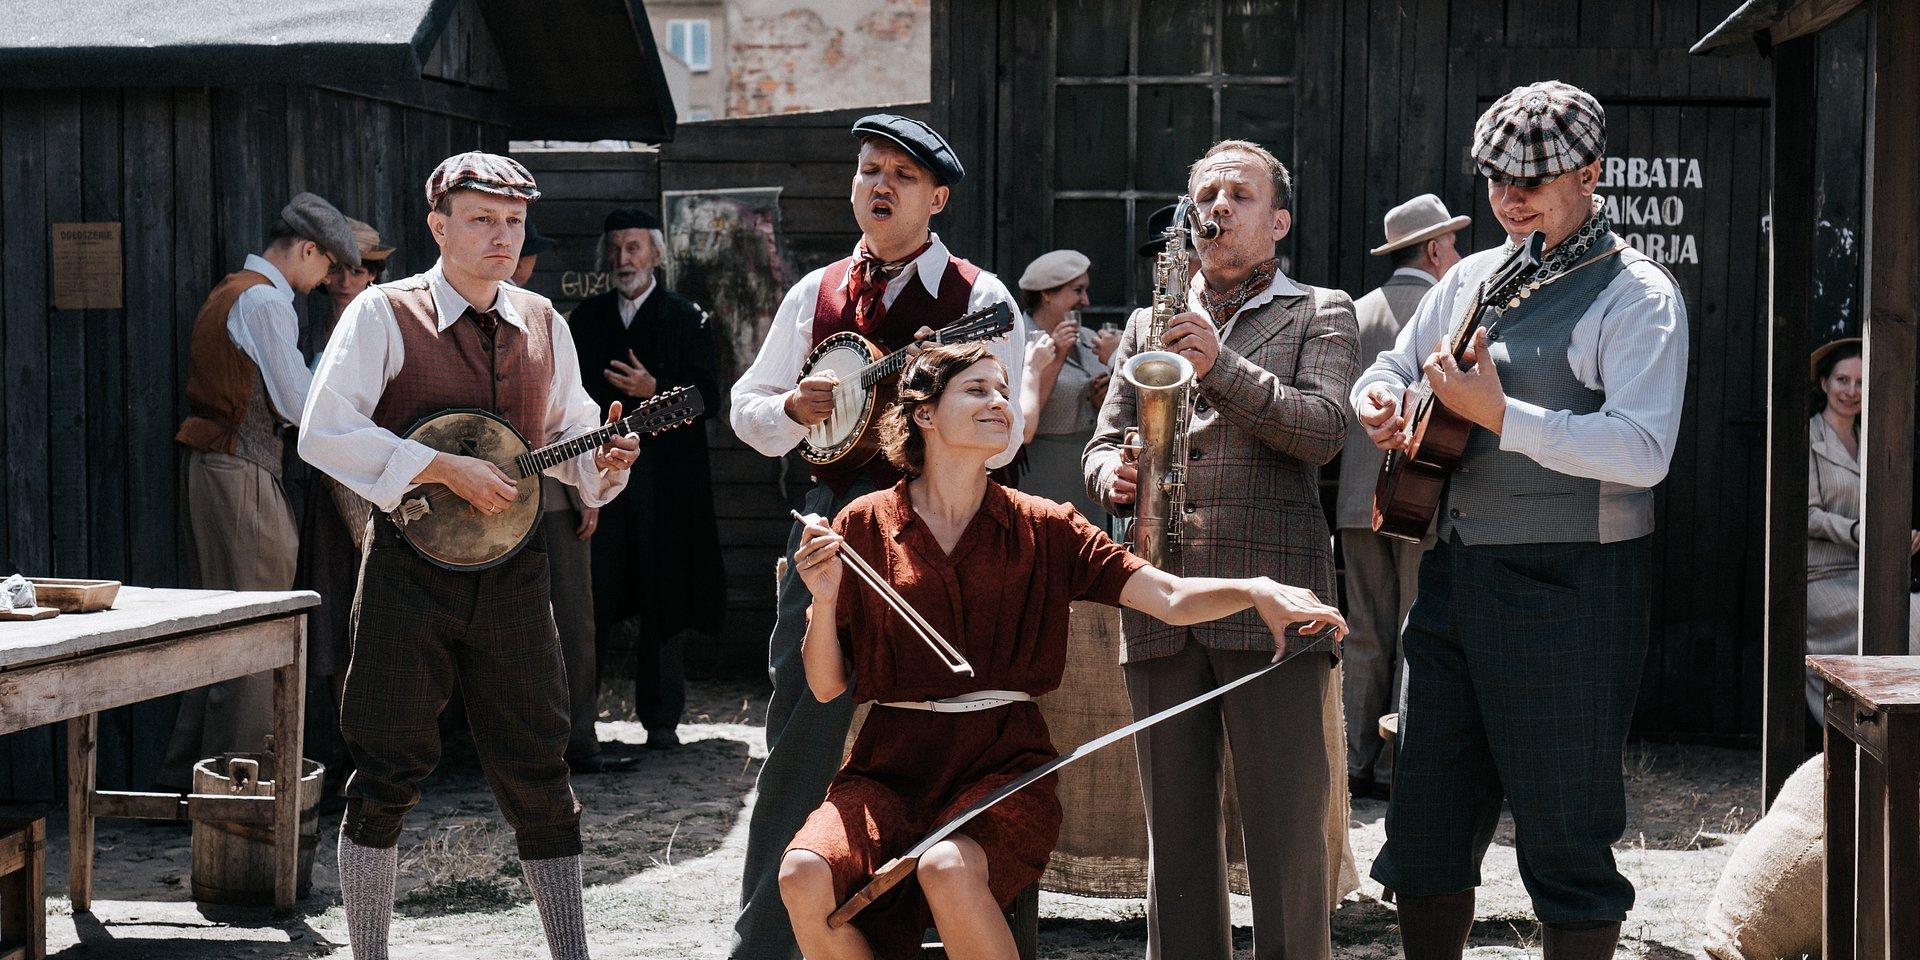 KRÓL: muzyka w serialu - ATANAS VALKOV i JAN EMIL MŁYNARSKI